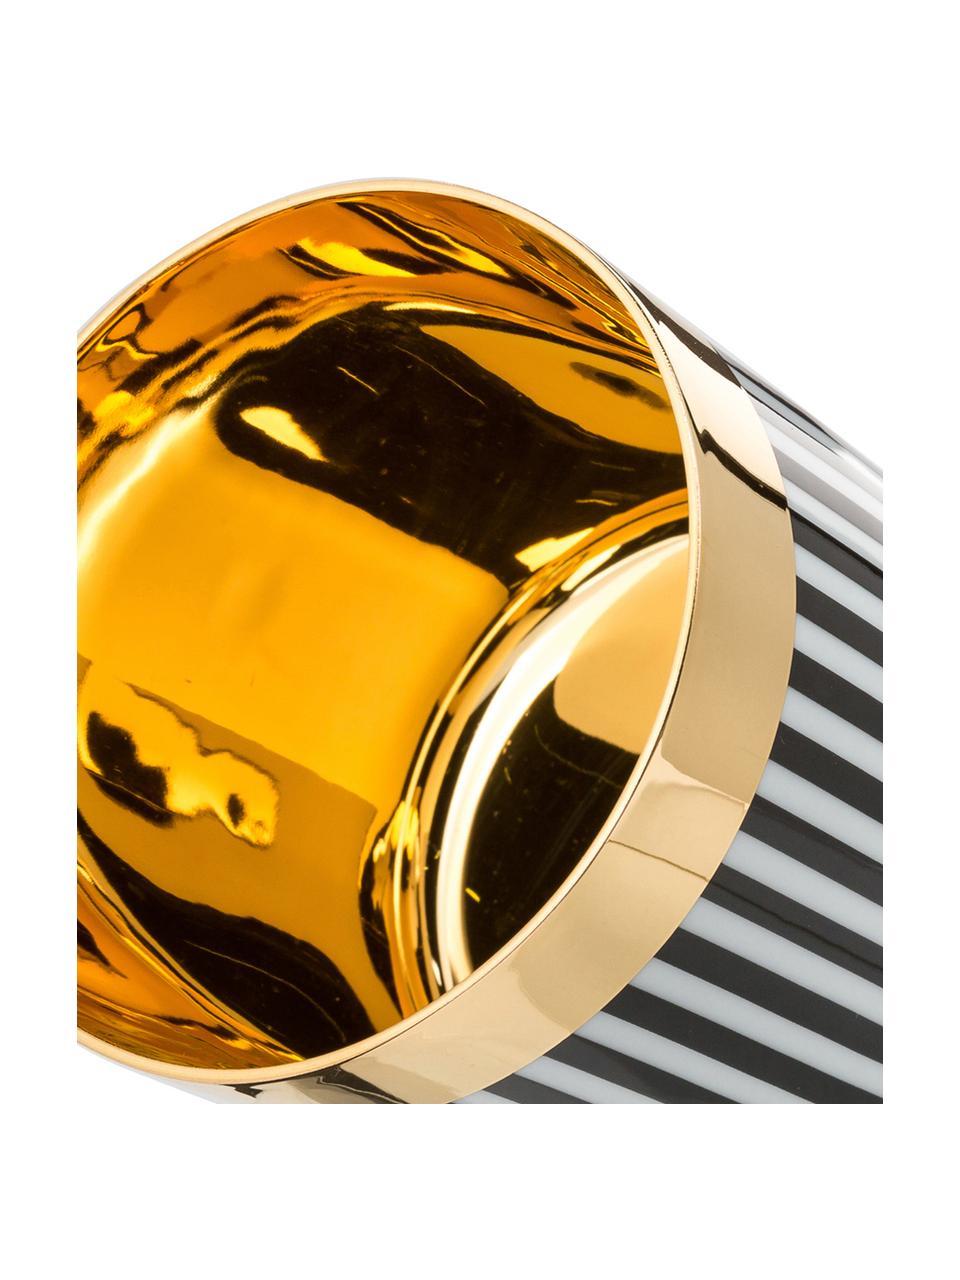 Vergoldeter Champagnerbecher Sip of Gold aus Porzellan, Rand: Vergoldet, Schwarz, Weiß, Gold, Ø 9 x H 7 cm